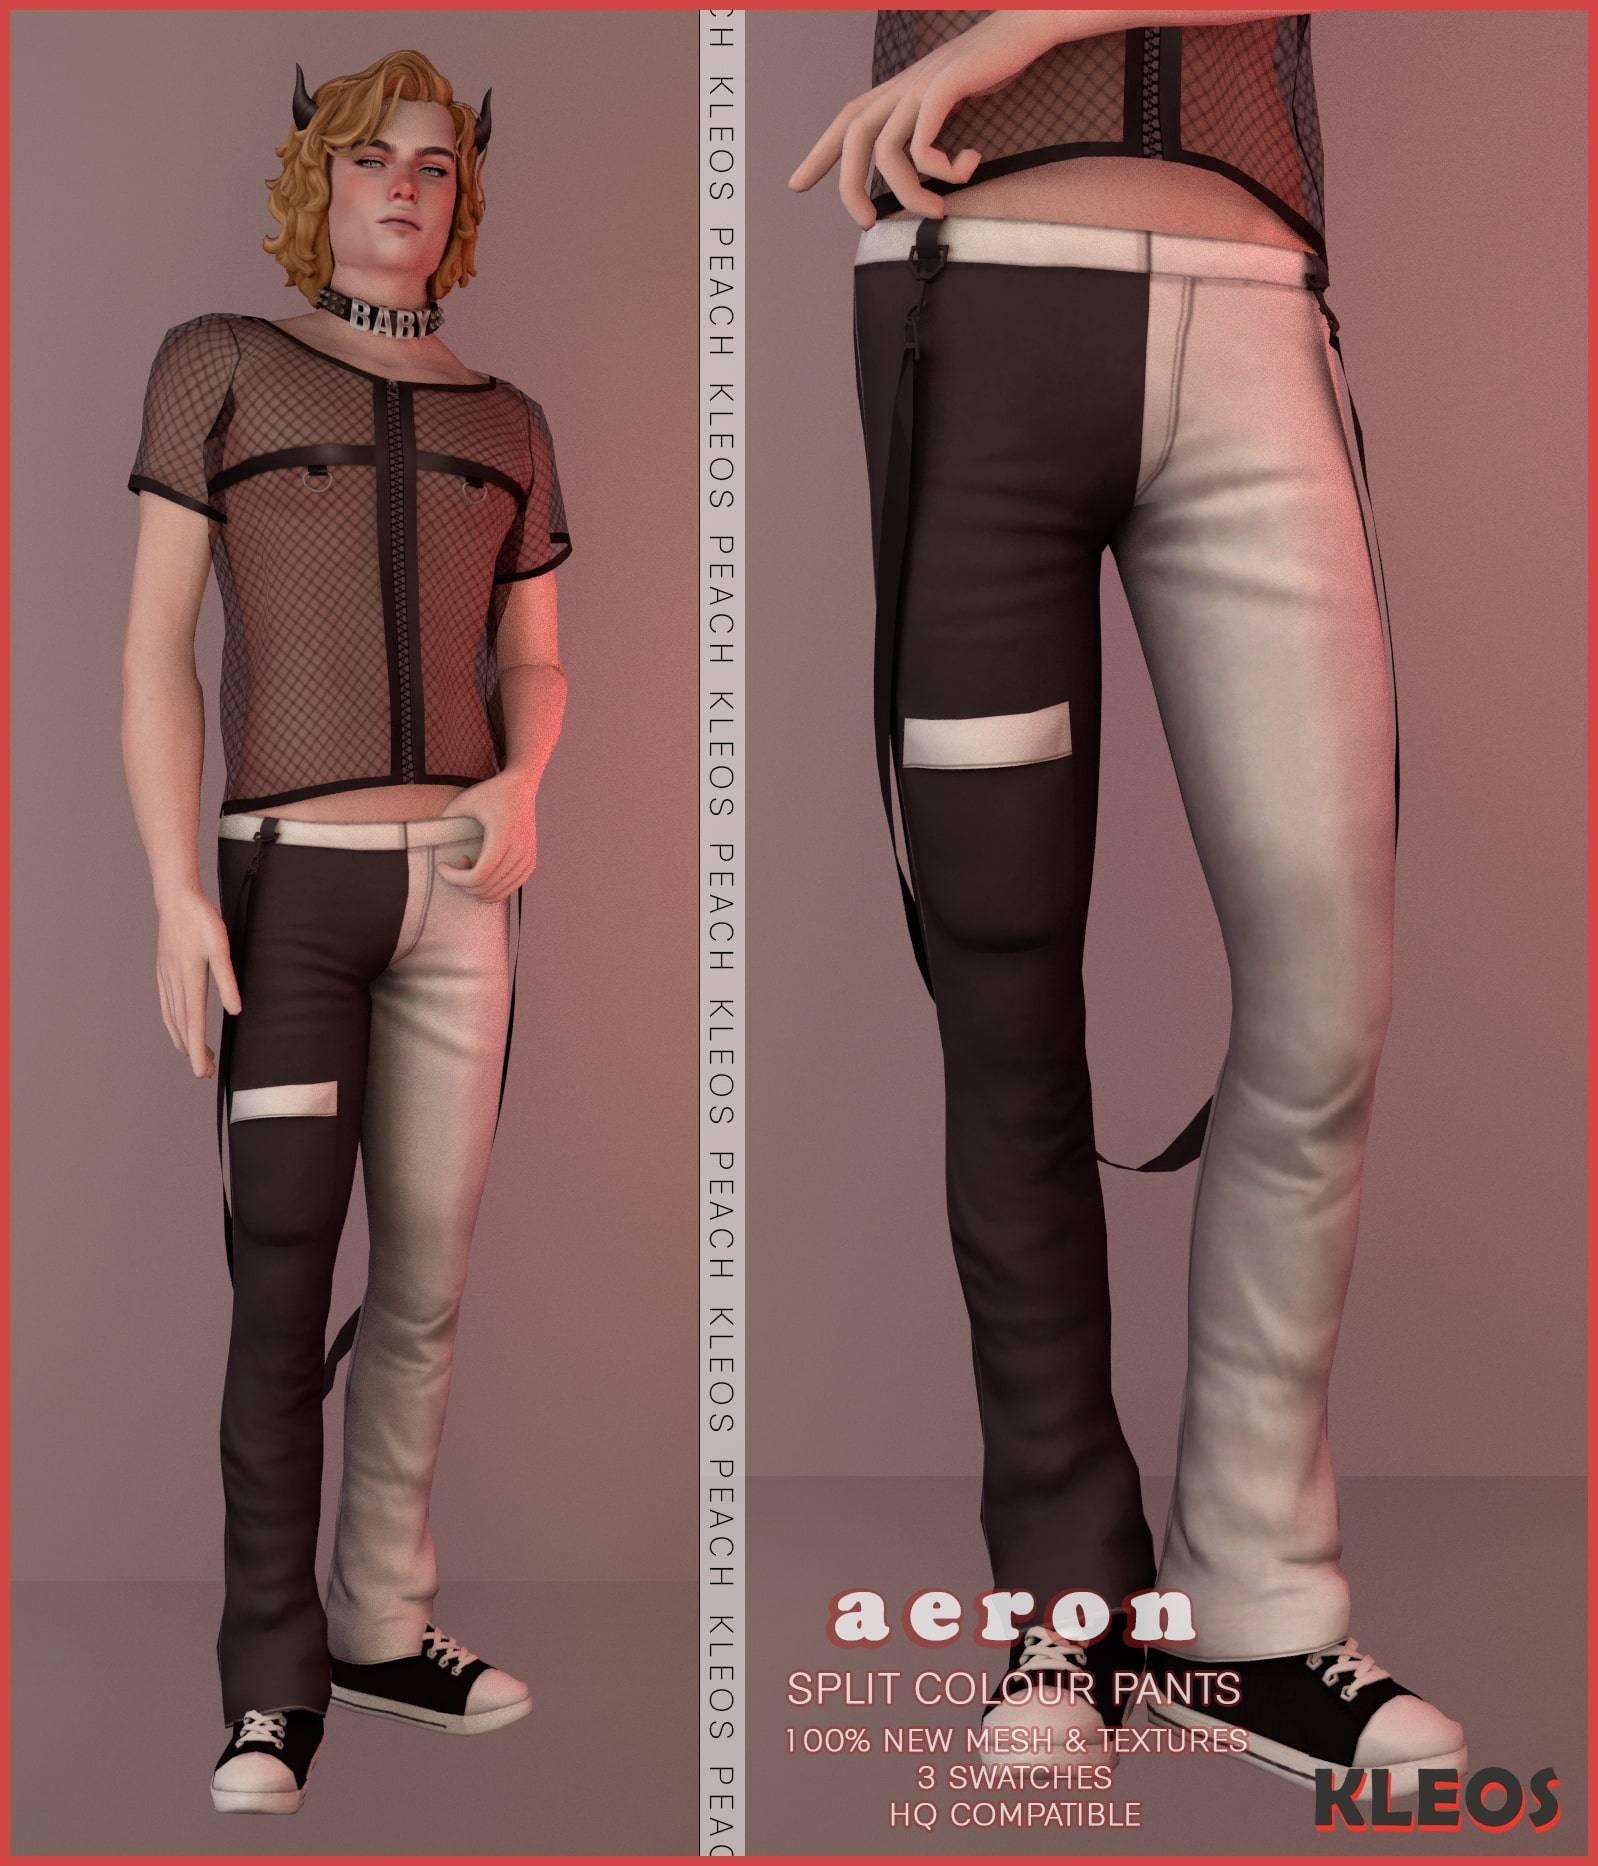 Мужские штаны - Aeron Split Colour Pants